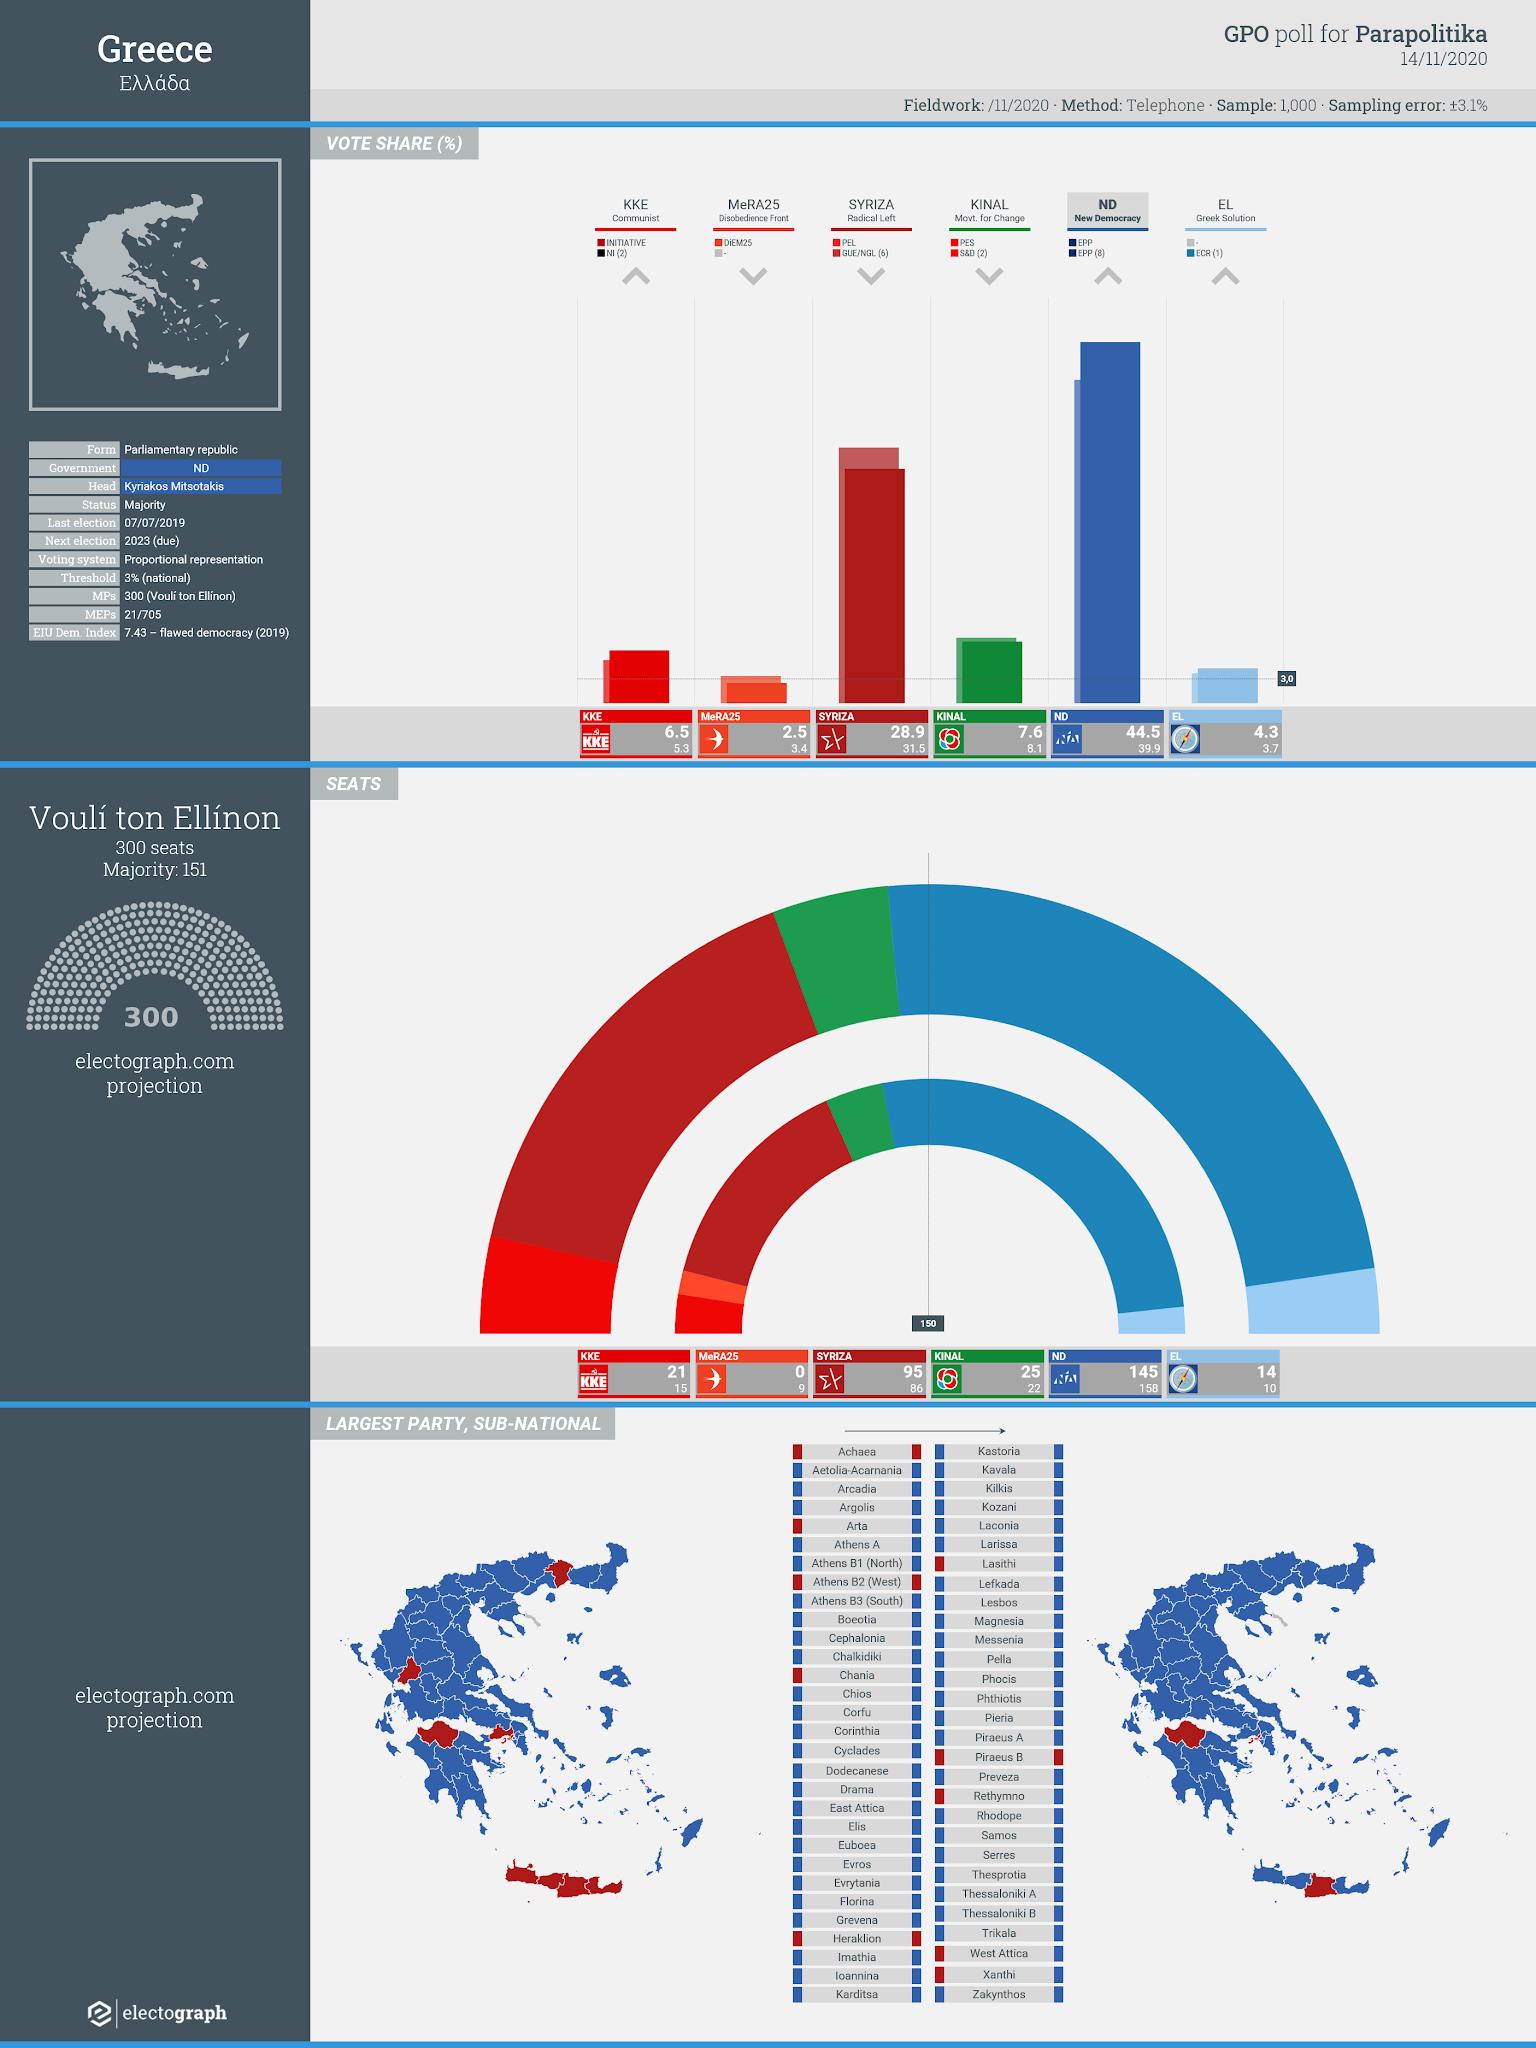 GREECE: GPO poll chart for Parapolitika, 14 November 2020